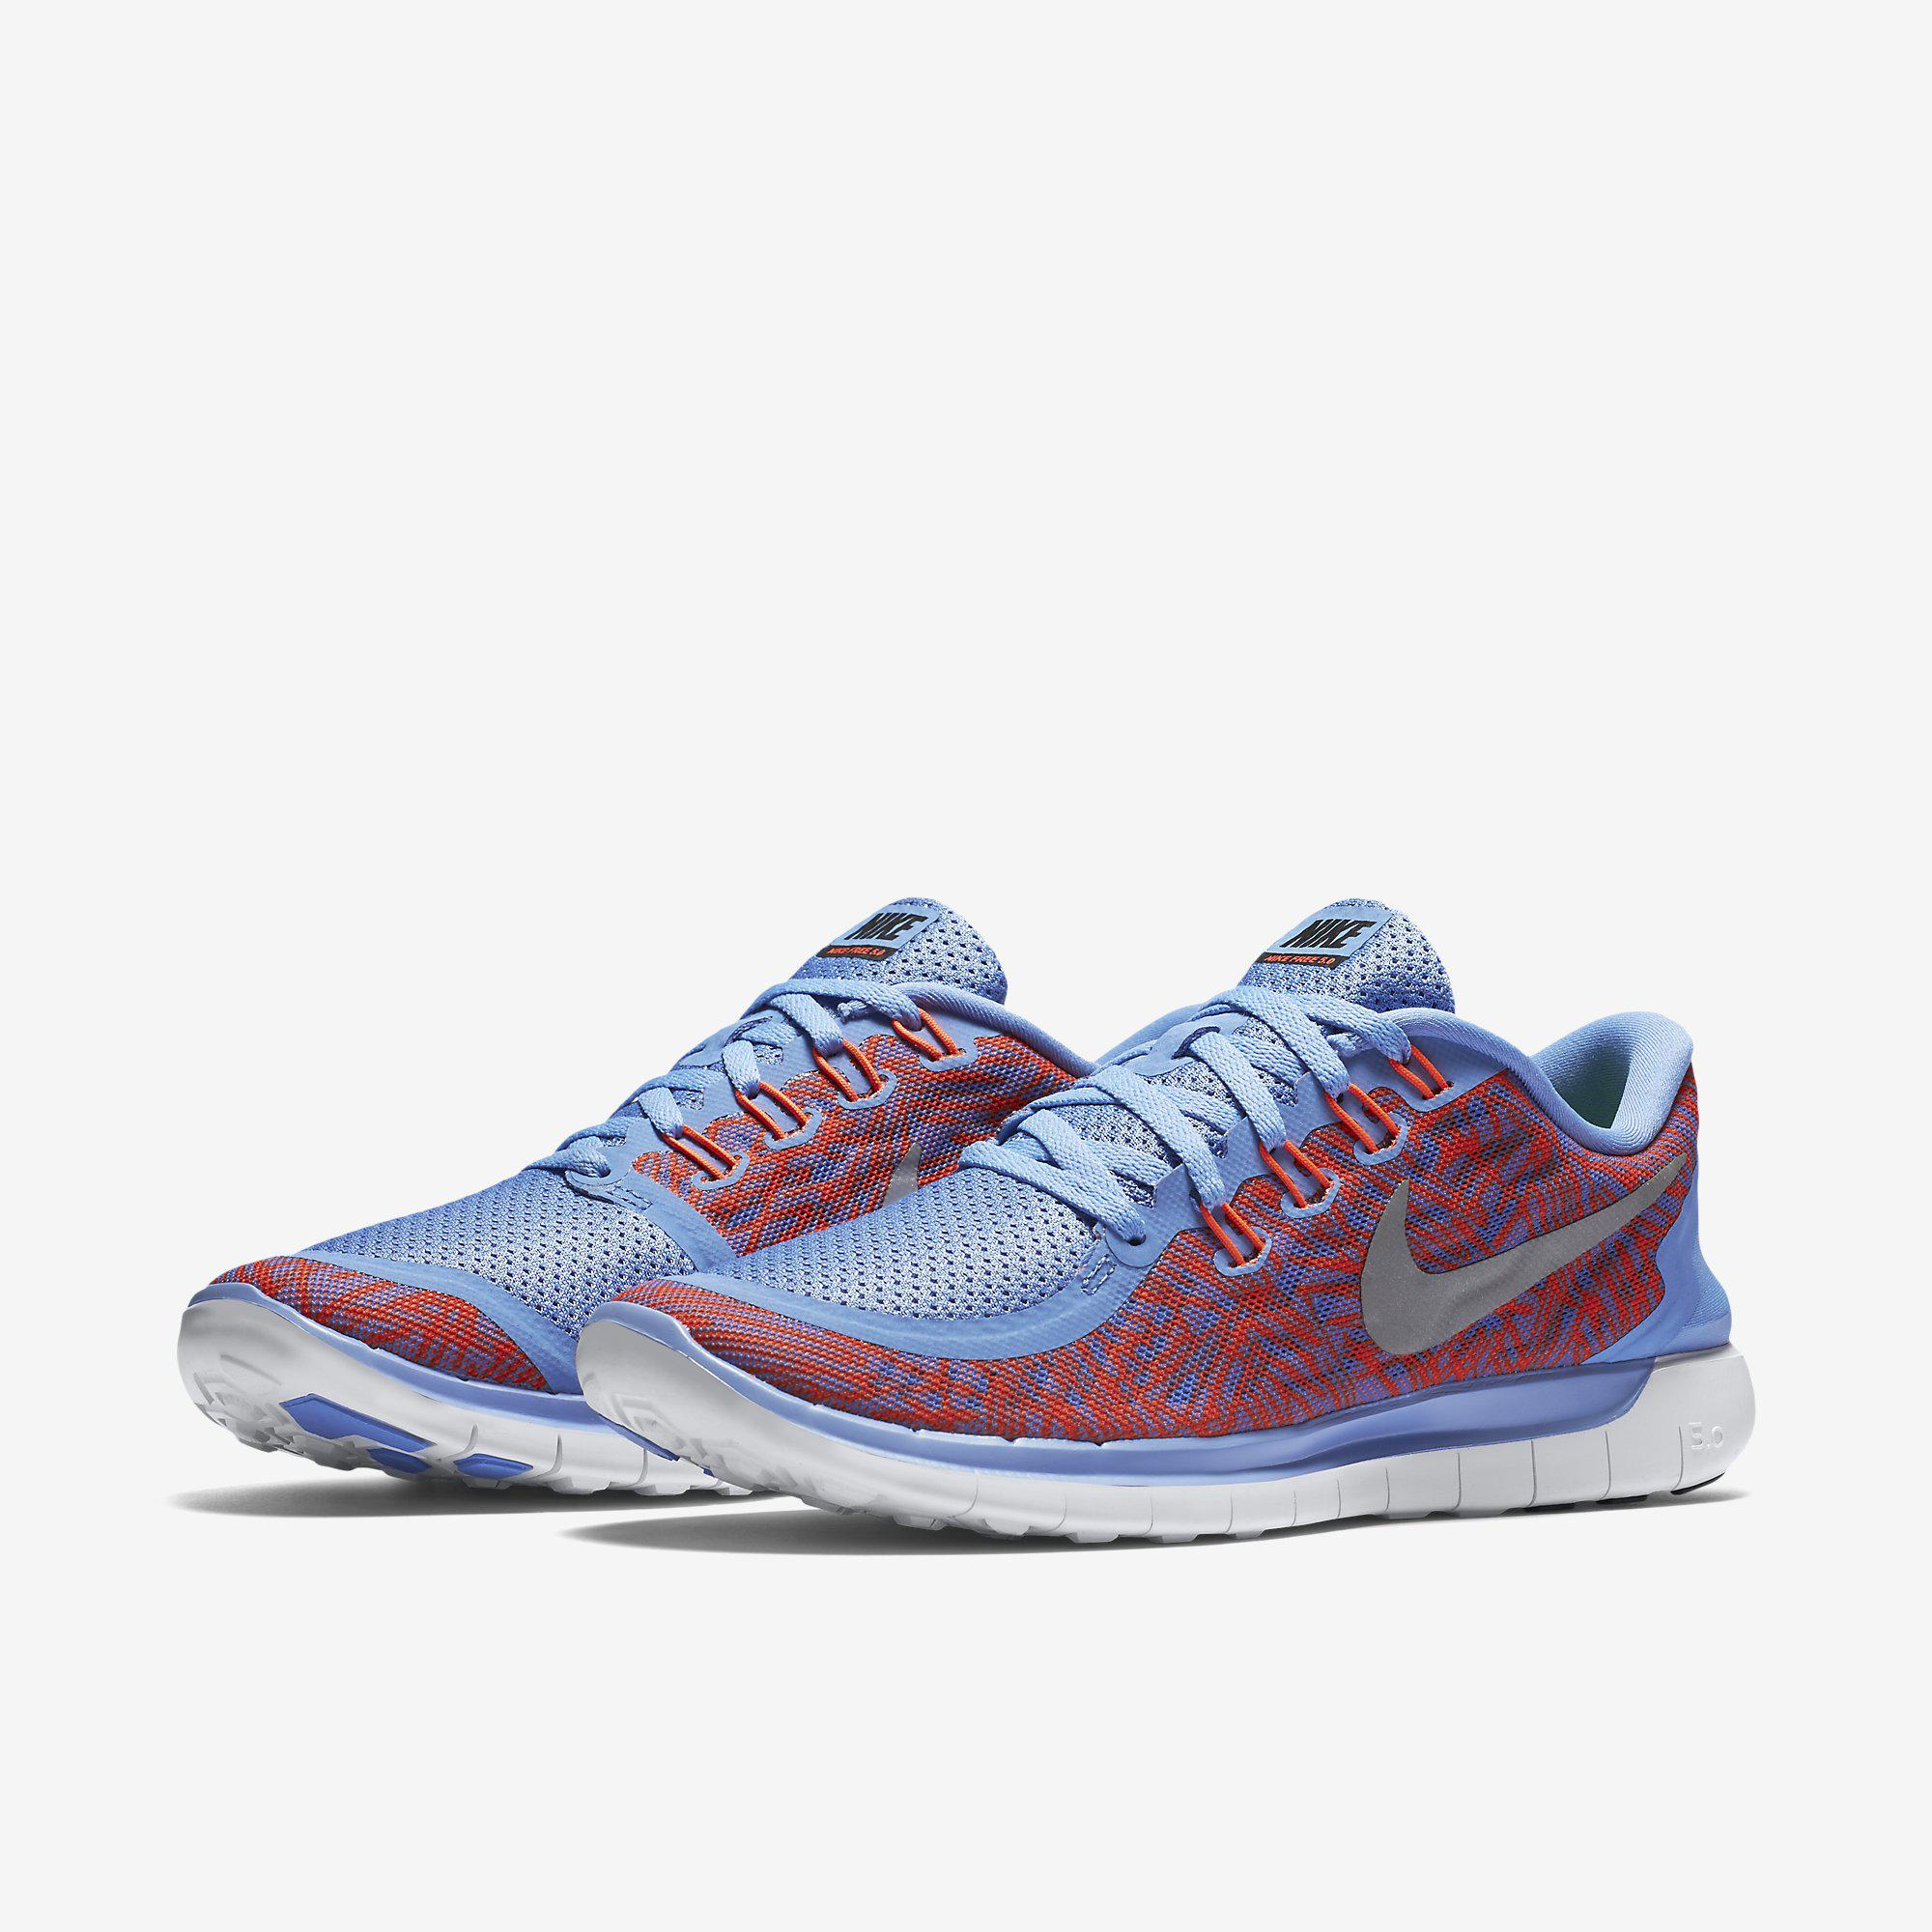 fd36259f1263 Nike Womens Free 5.0 Print Running Shoes - Chalk Blue - Tennisnuts.com